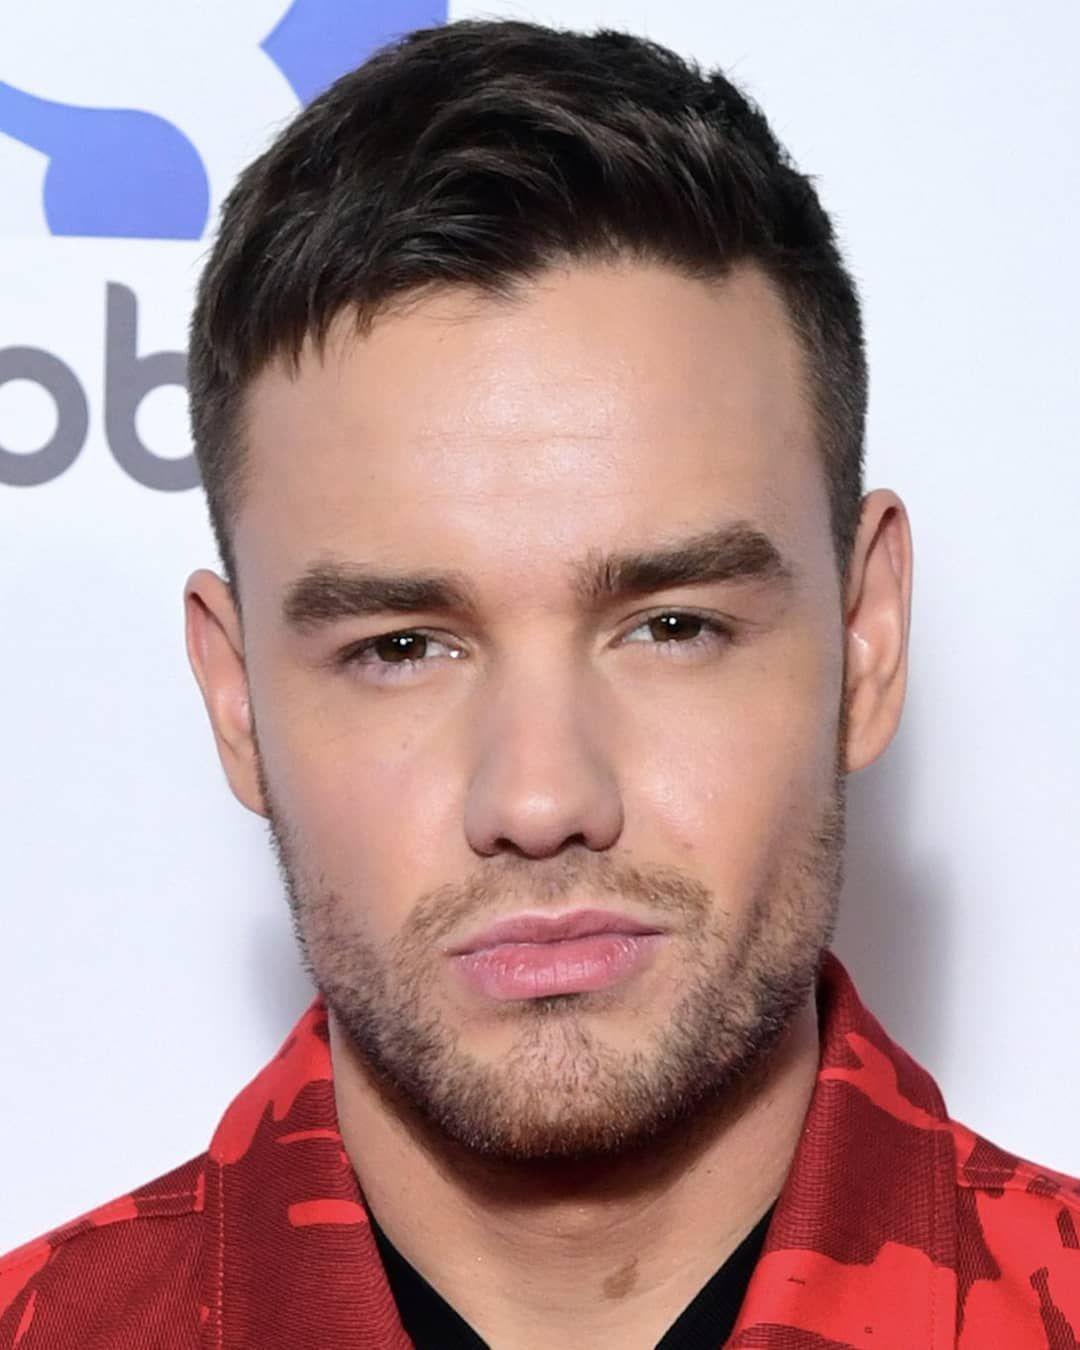 Look At This Handsome Man Liamdeservestheworld Alliwantforchristmas Lp1 Stackitup Familiar Stripthatdown Foryou Liam Payne Liam James Handsome Men